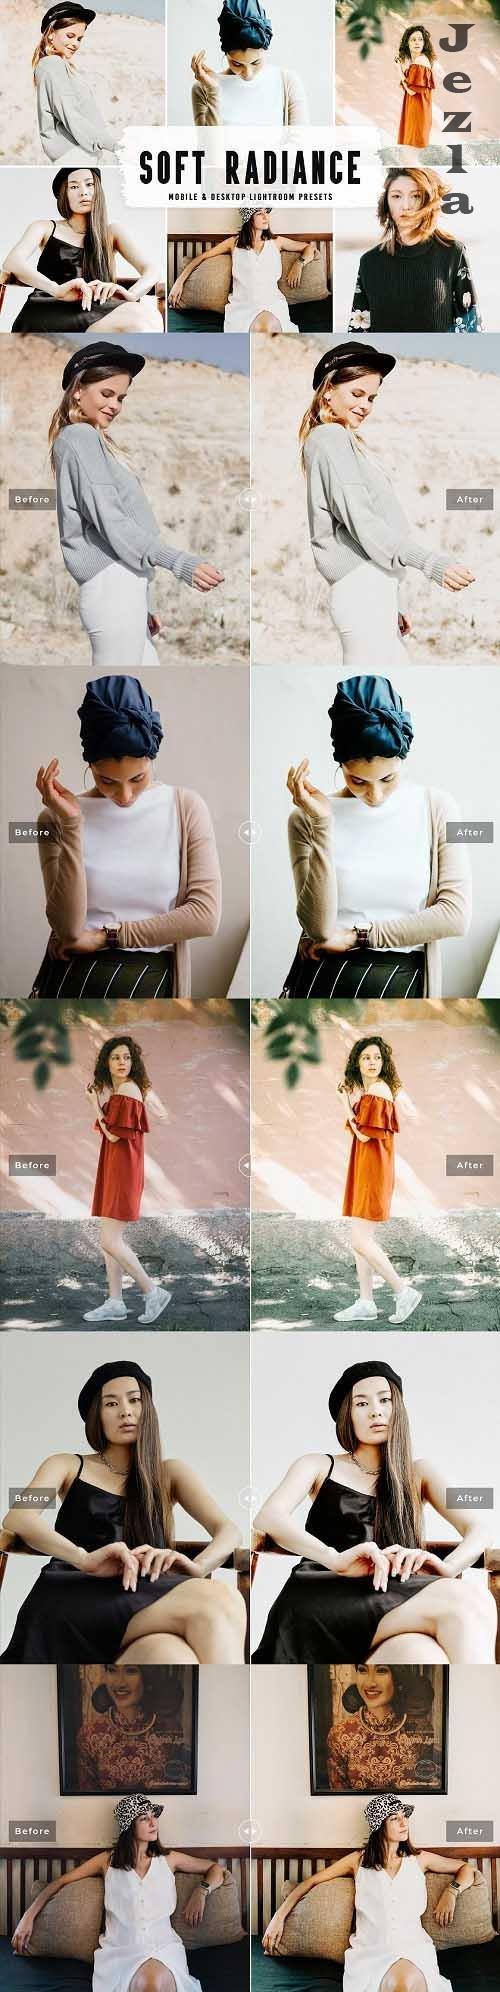 Soft Radiance Pro LRM Presets - 6525744